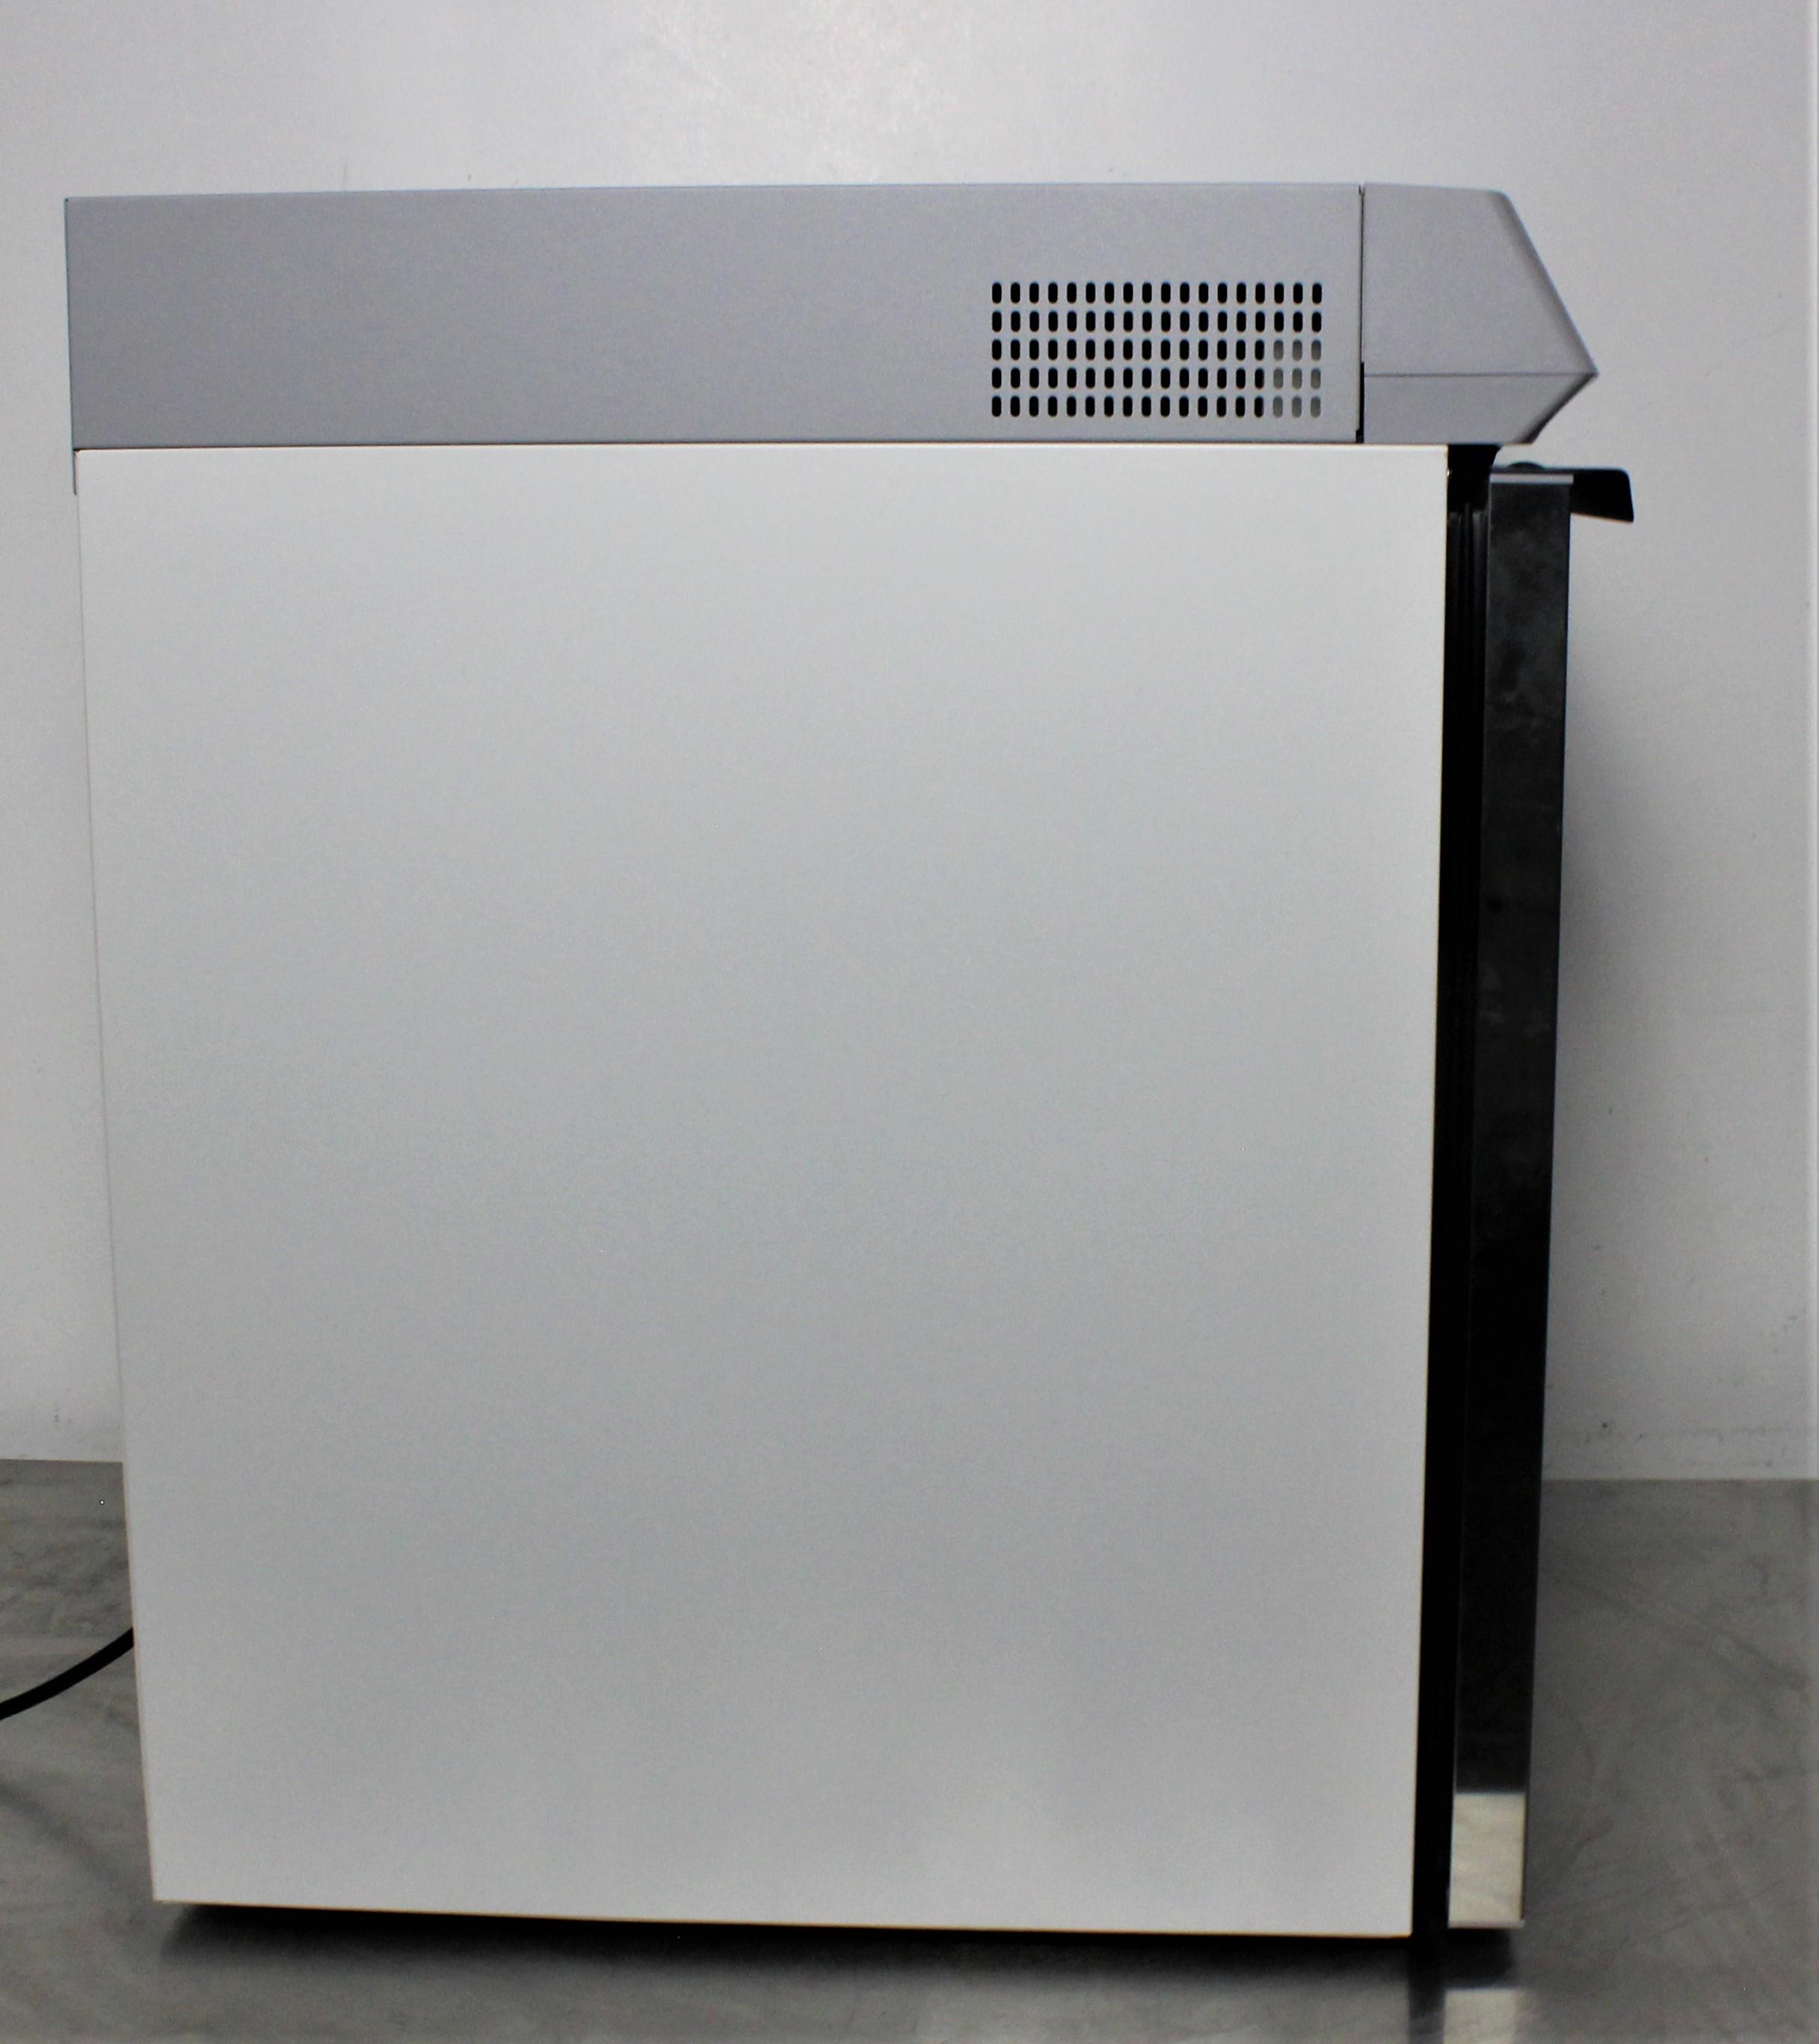 Image THERMO SCIENTIFIC TSX505GA High-Performance Undercounter Refrigerator 1587196